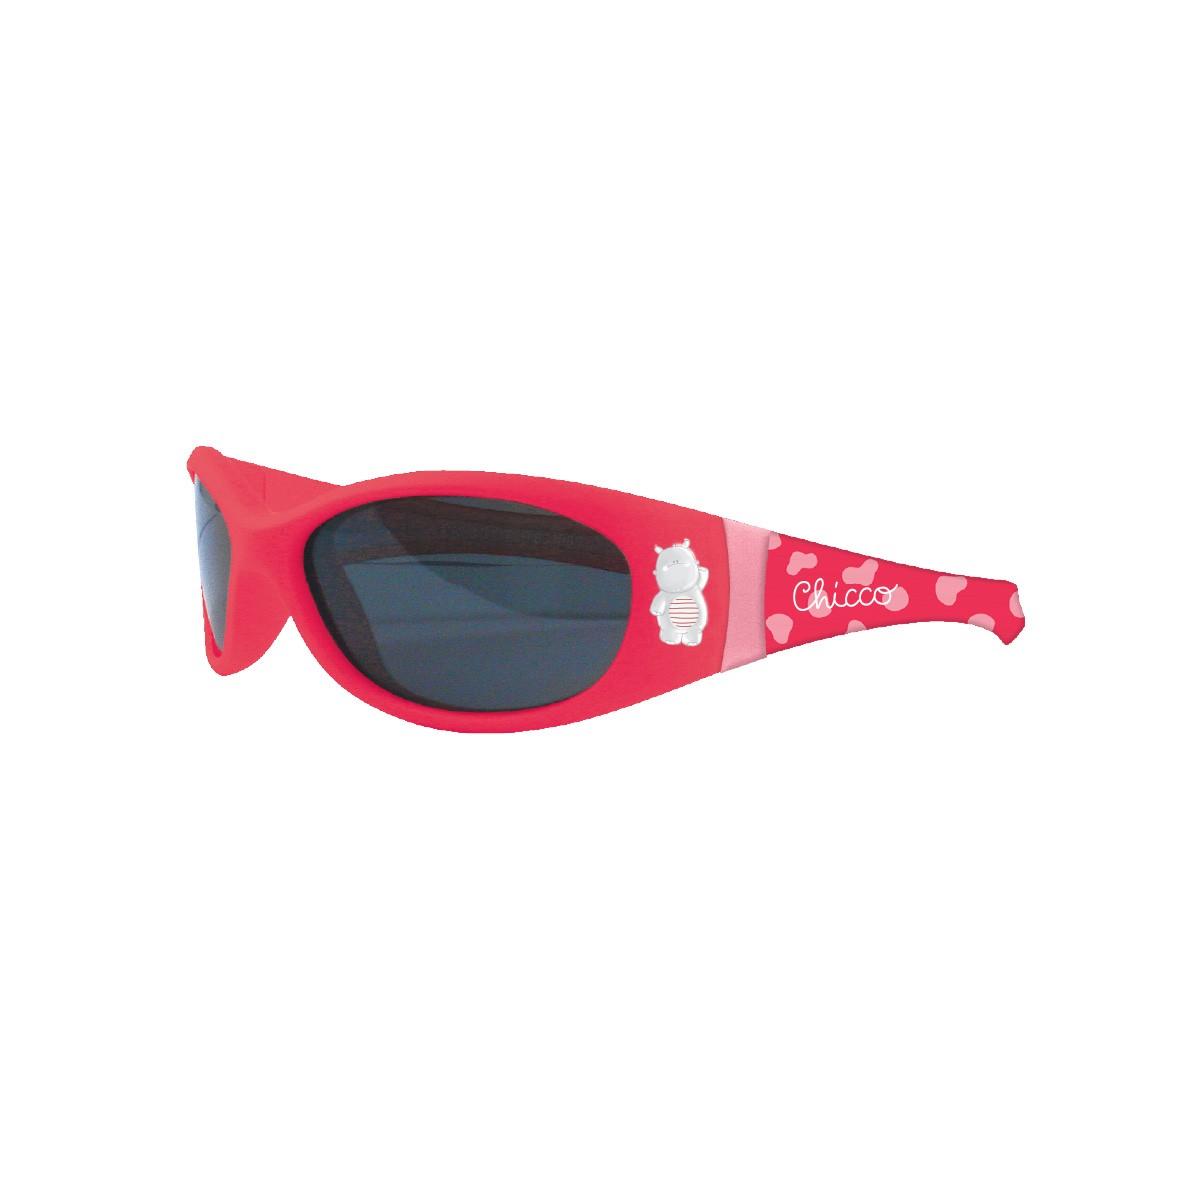 a67429302 Chicco Pancake Óculos de Sol Menina 12M+ aSuaFarmáciaOnline